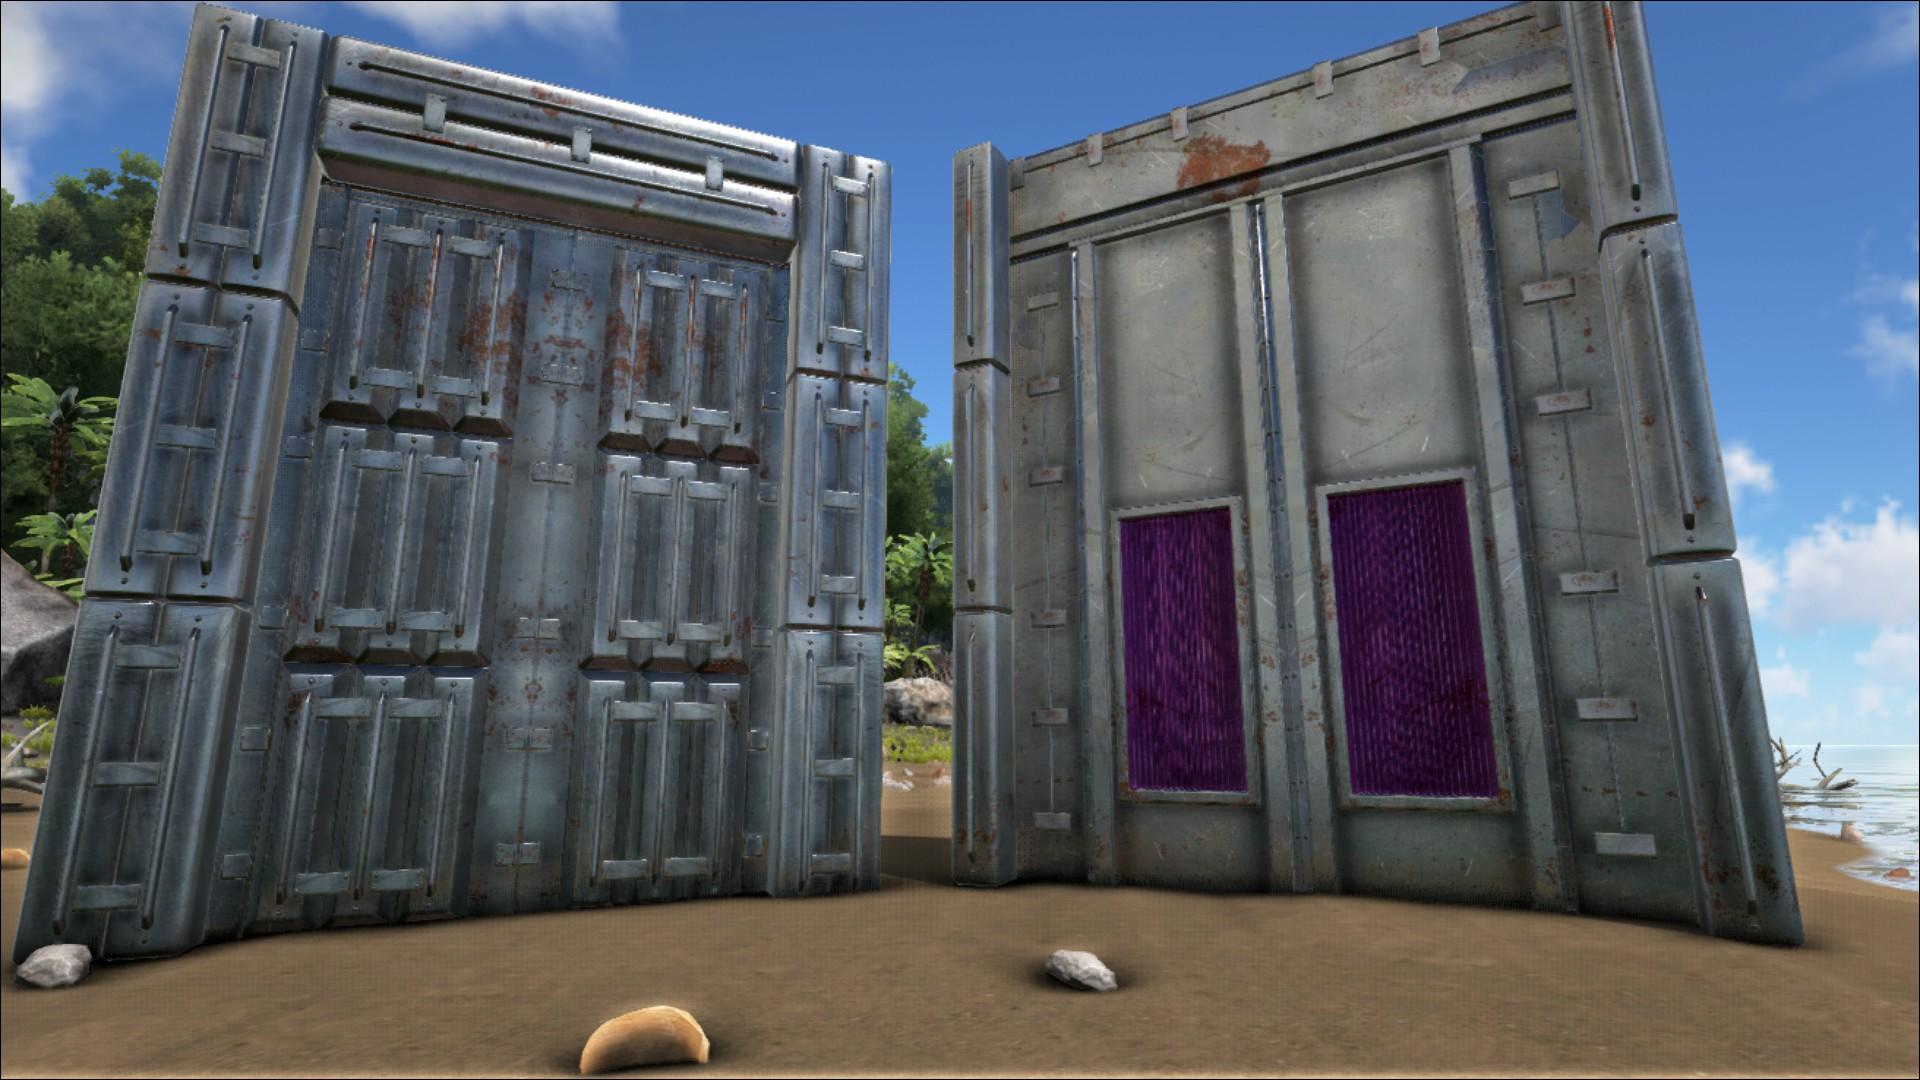 ... Region 6 & Metal Dinosaur Gate - Official ARK: Survival Evolved Wiki Pezcame.Com